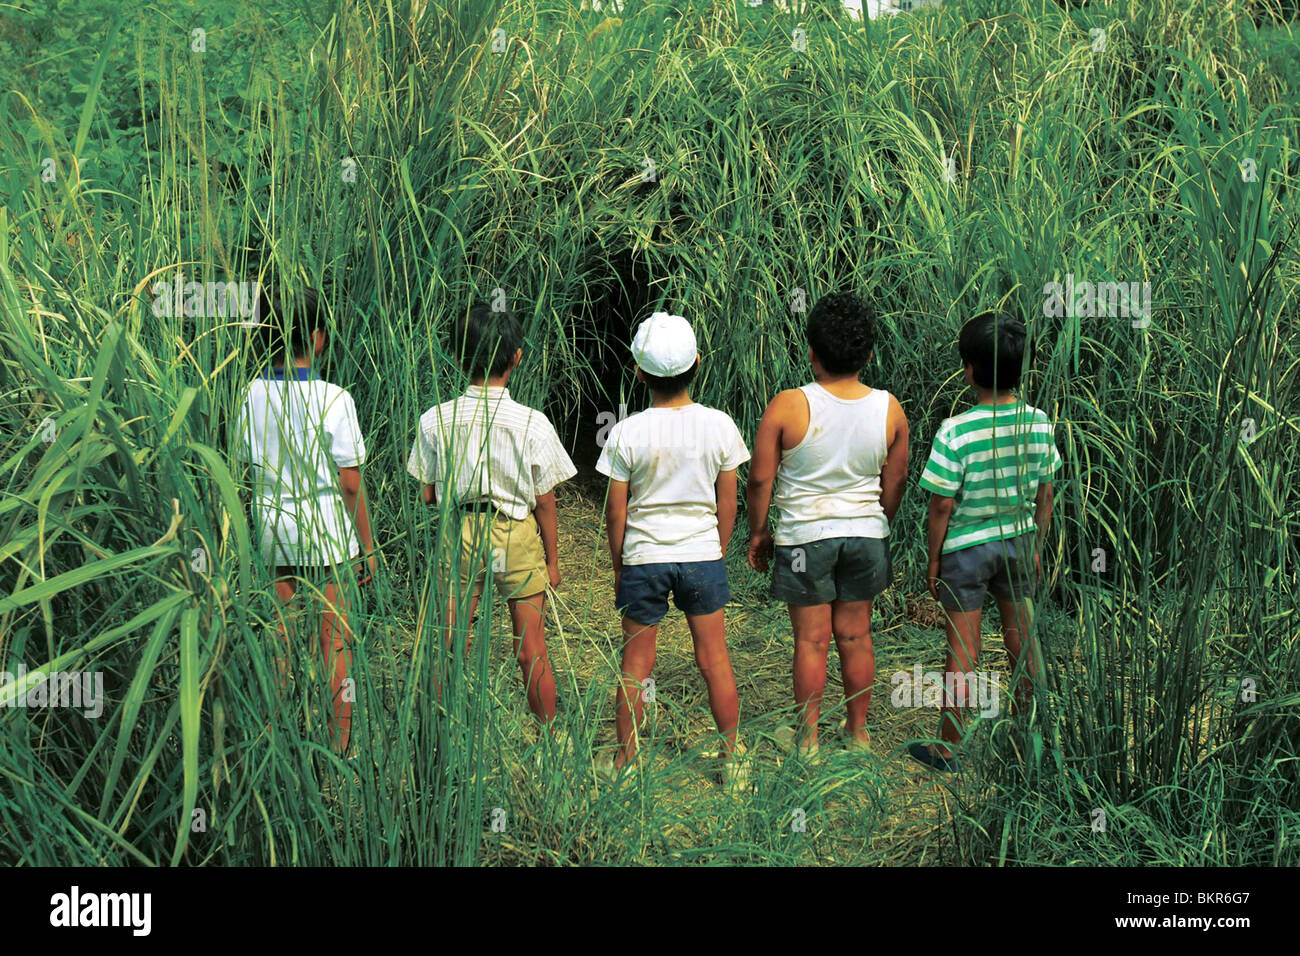 20-SEIKI SHONEN (2008) 20TH CENTURY Boys (ALT) YUKIHIKO TSUTSUMI (DIR) 001 Imagen De Stock